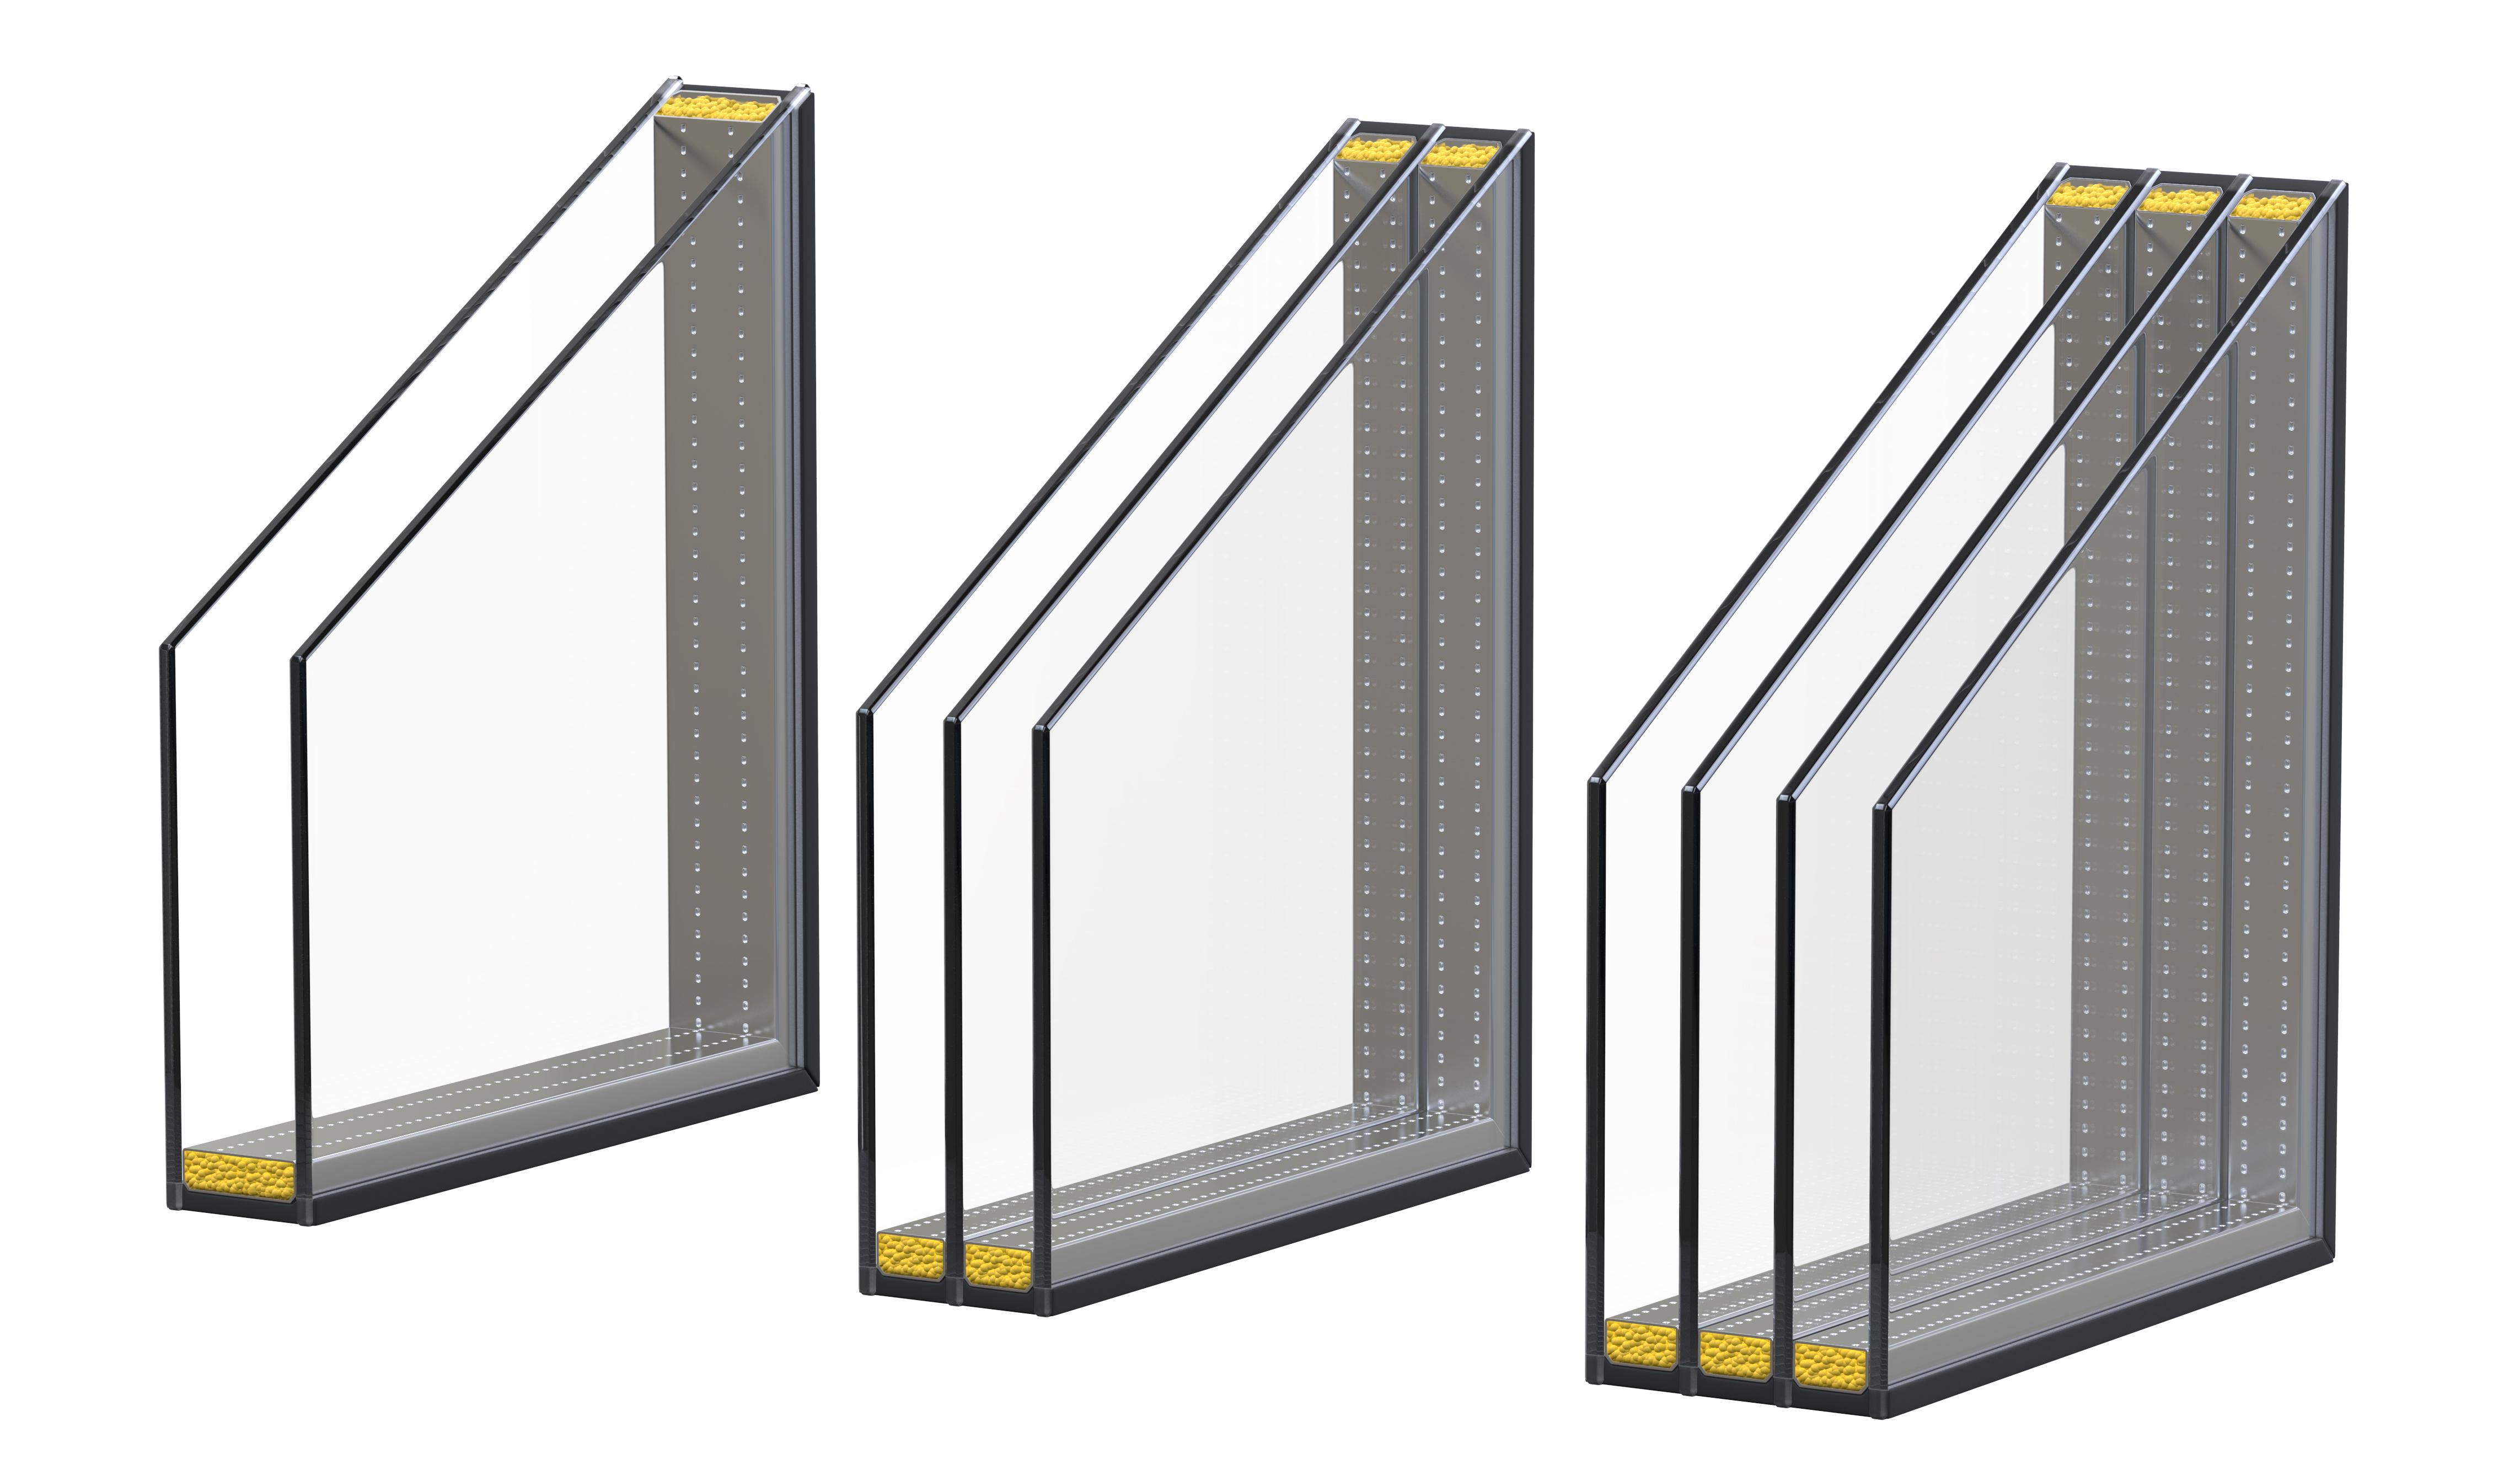 triple glas, quadro glas, dubbel glas, tweevoudig glas, drievoudig glas, viervoudig glas, HR glas, hr++, hr+++, hr++++glas, isolatie glas, isolerende glas, energiezuinig glas, besparend glas, duurzaam glas, verduurzaamheid glas, driedubbel glas, vierdubbel glas, dubbelglas,